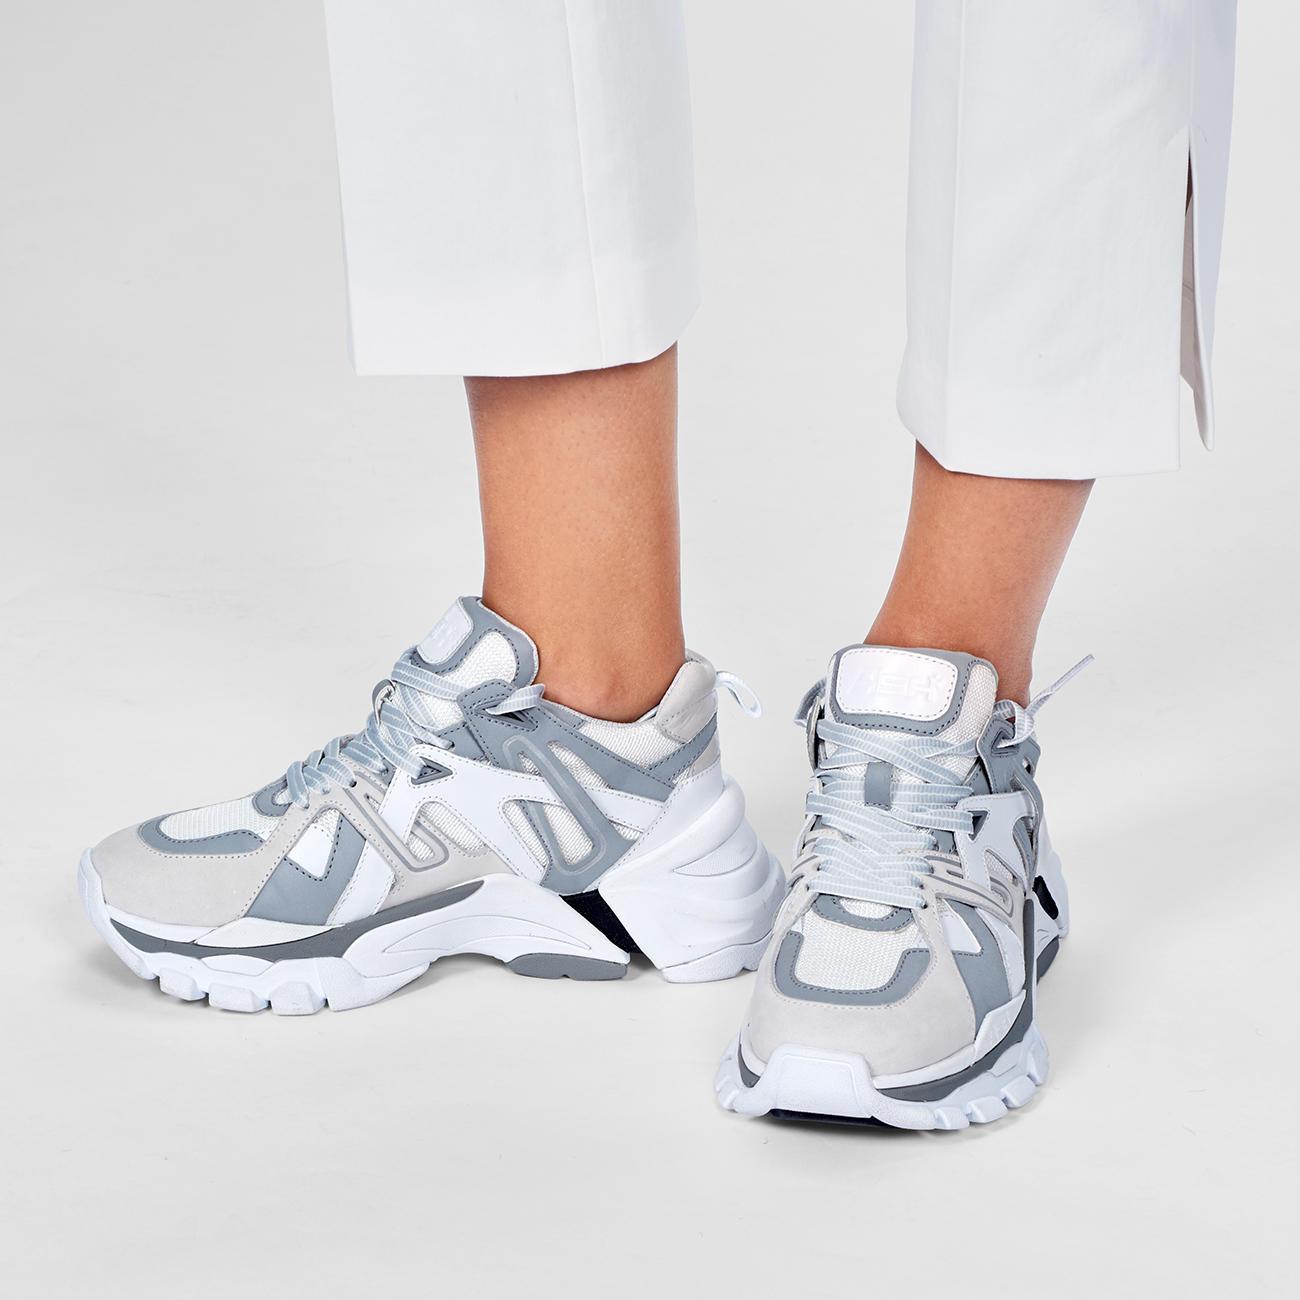 Ash Bulky Sneakers   Designer Highlights